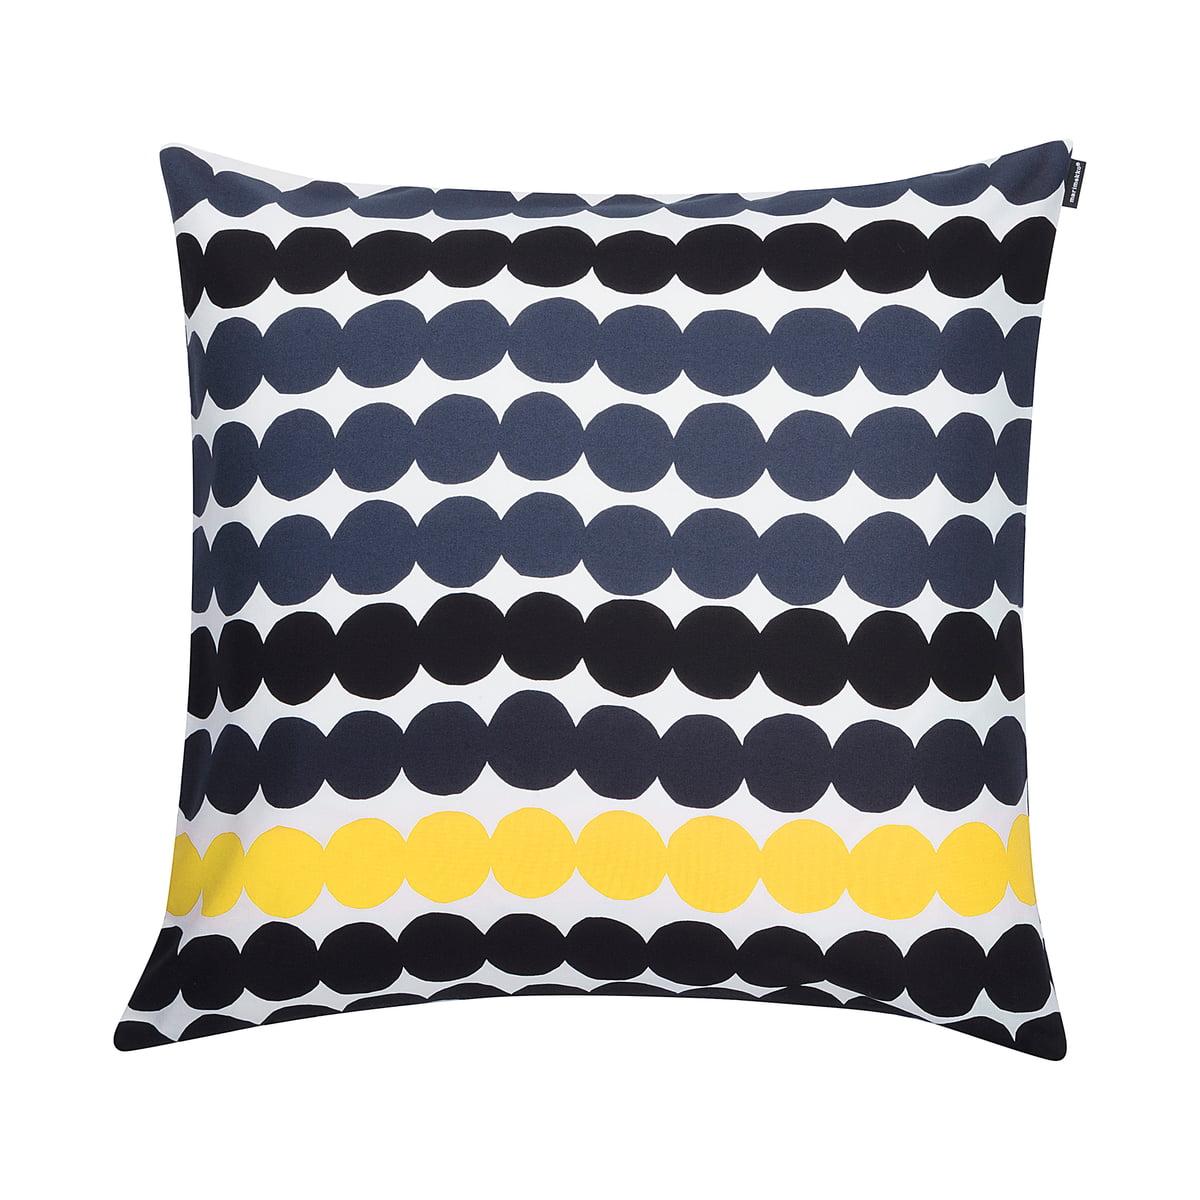 Rasymatto Cushion Cover By Marimekko